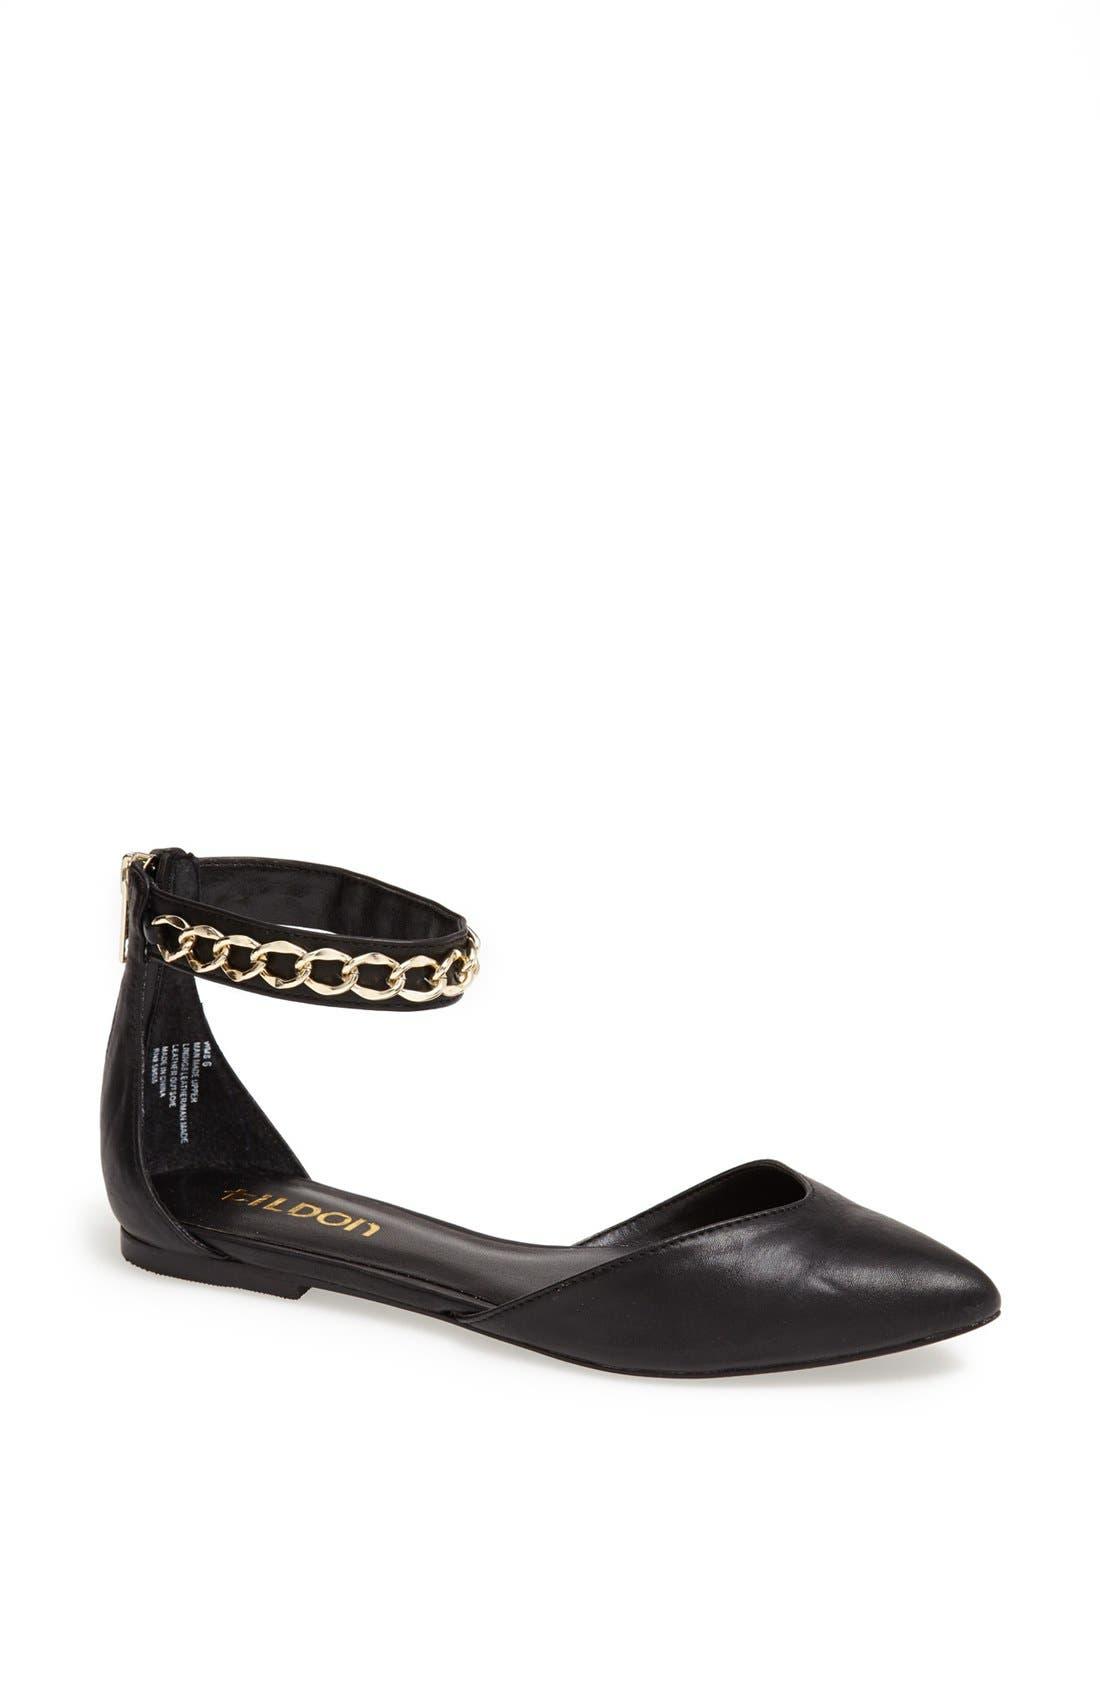 TILDON 'Anya' Ankle Strap D'Orsay Flat, Main, color, 001